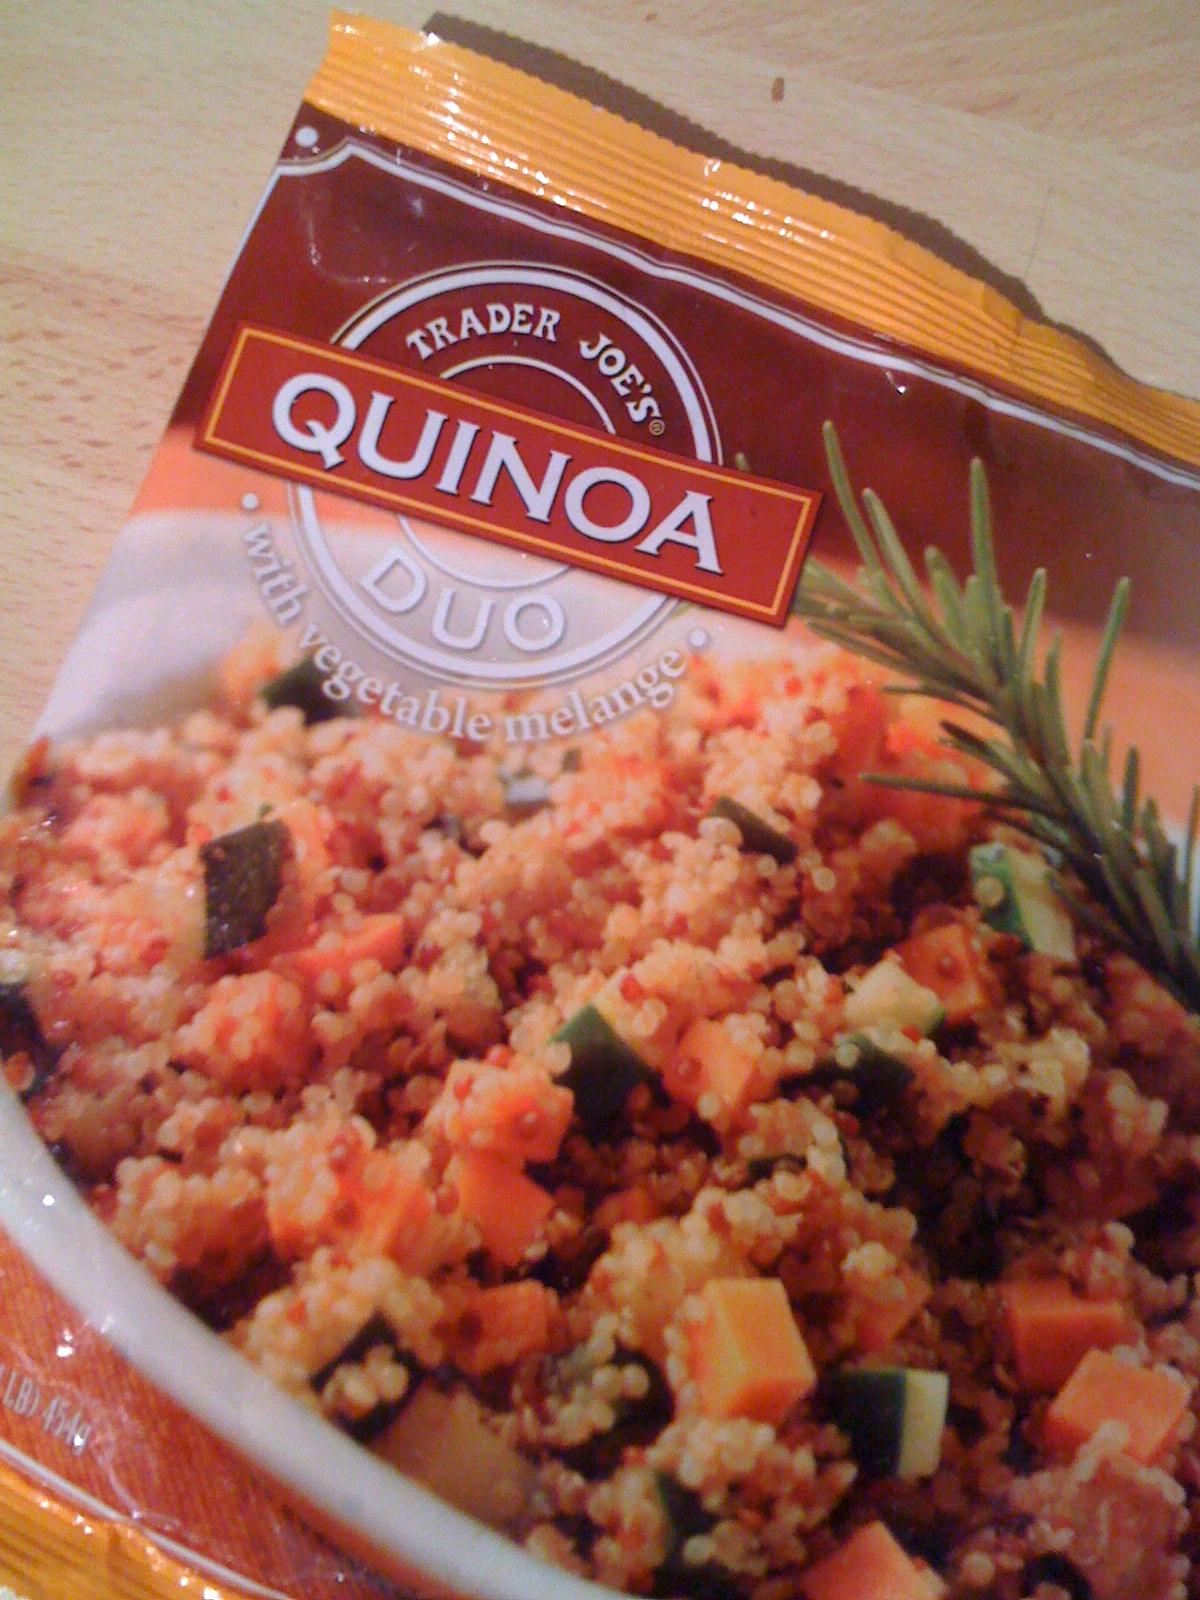 Ingest trader joe 39 s quinoa duo for Trader joe s fish